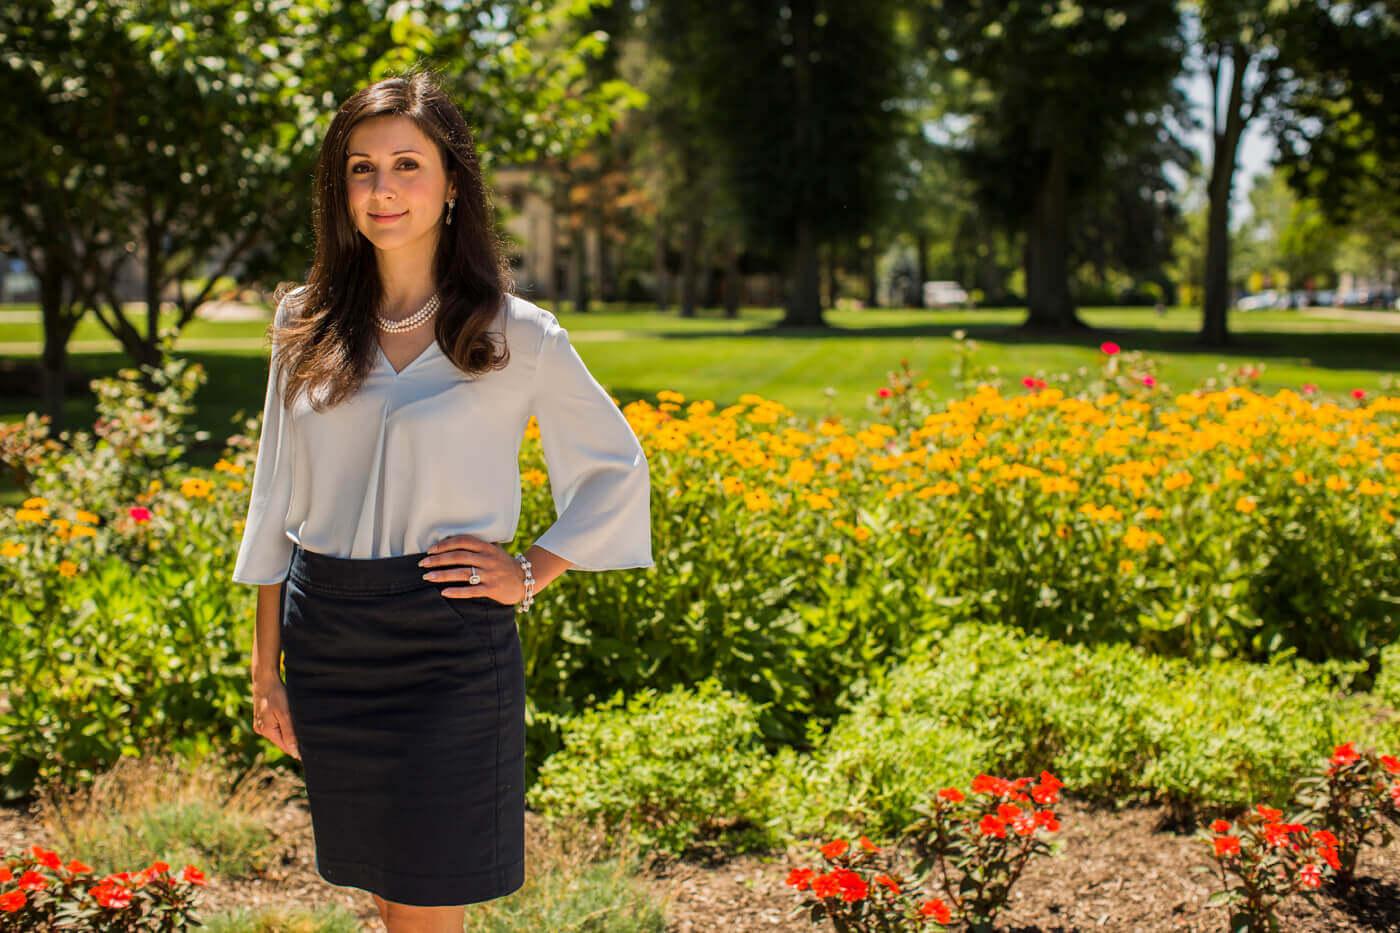 Christine Hennigan, Graduate Student